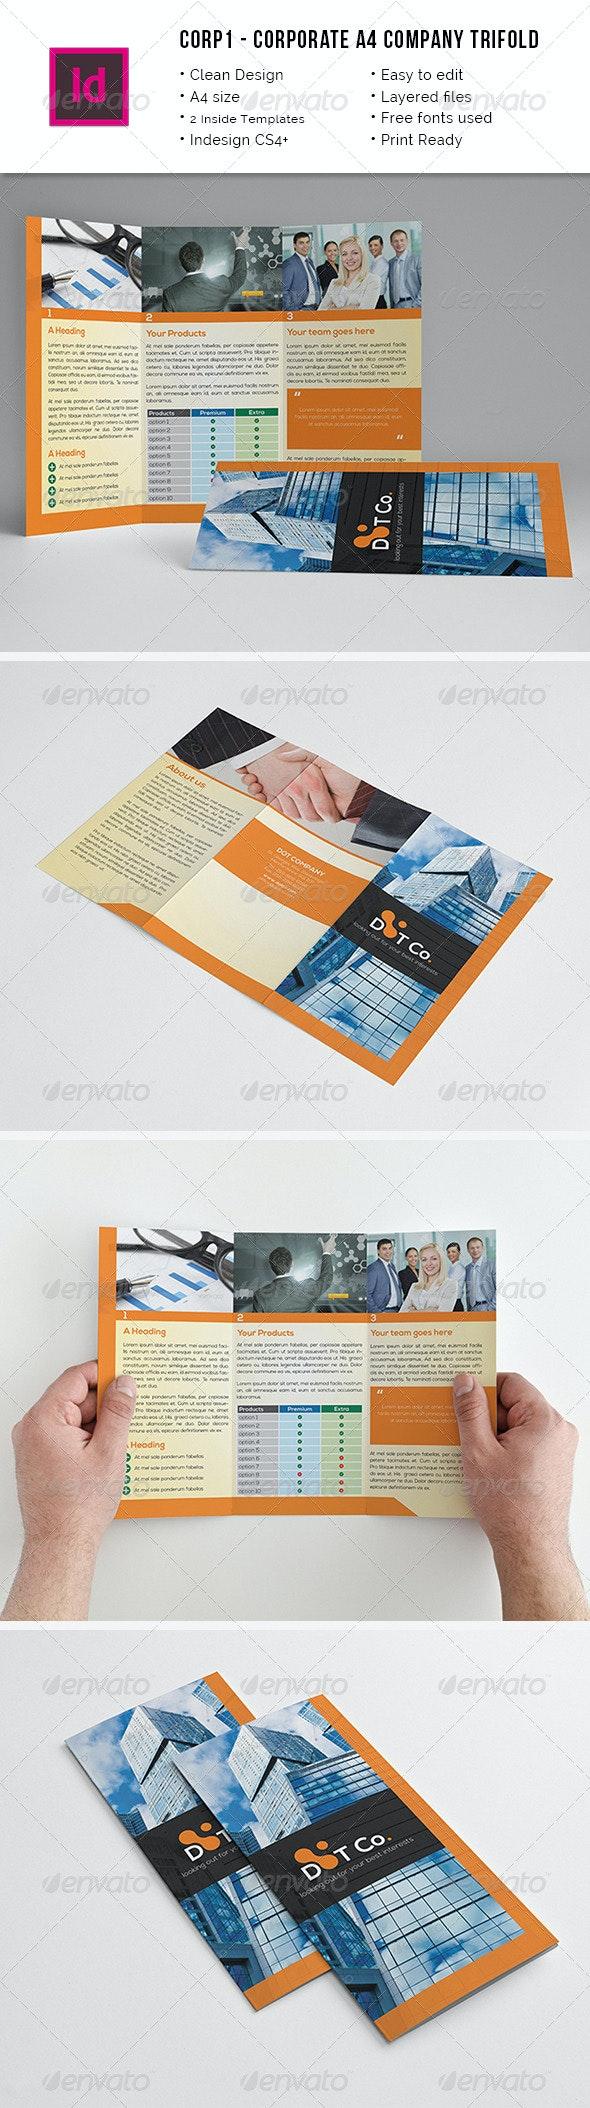 Corporate Trifold A4 Brochure - Corporate Brochures